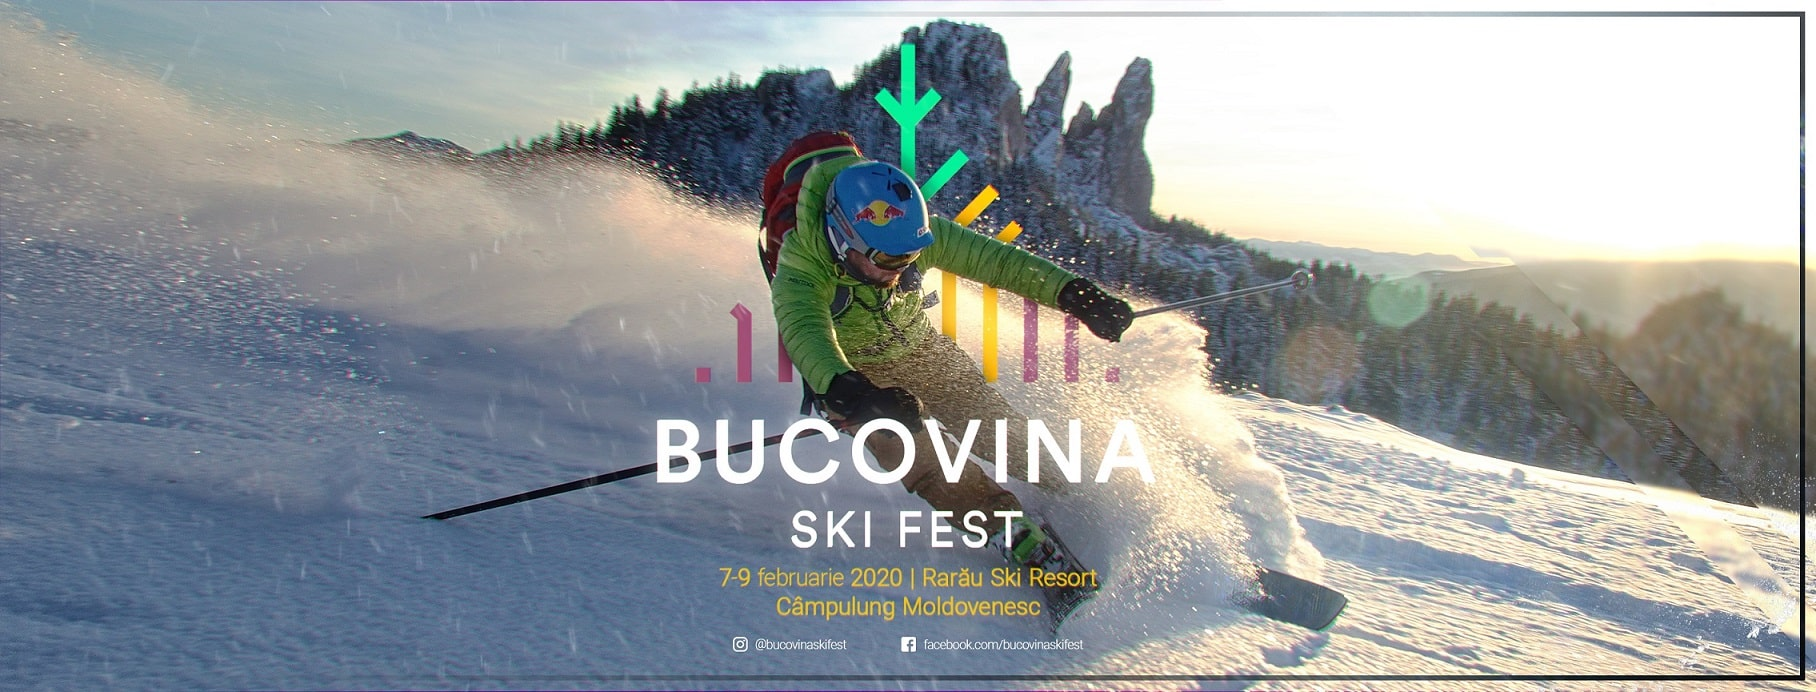 Bucovina Ski Fest are loc între 7-9 februarie 2020